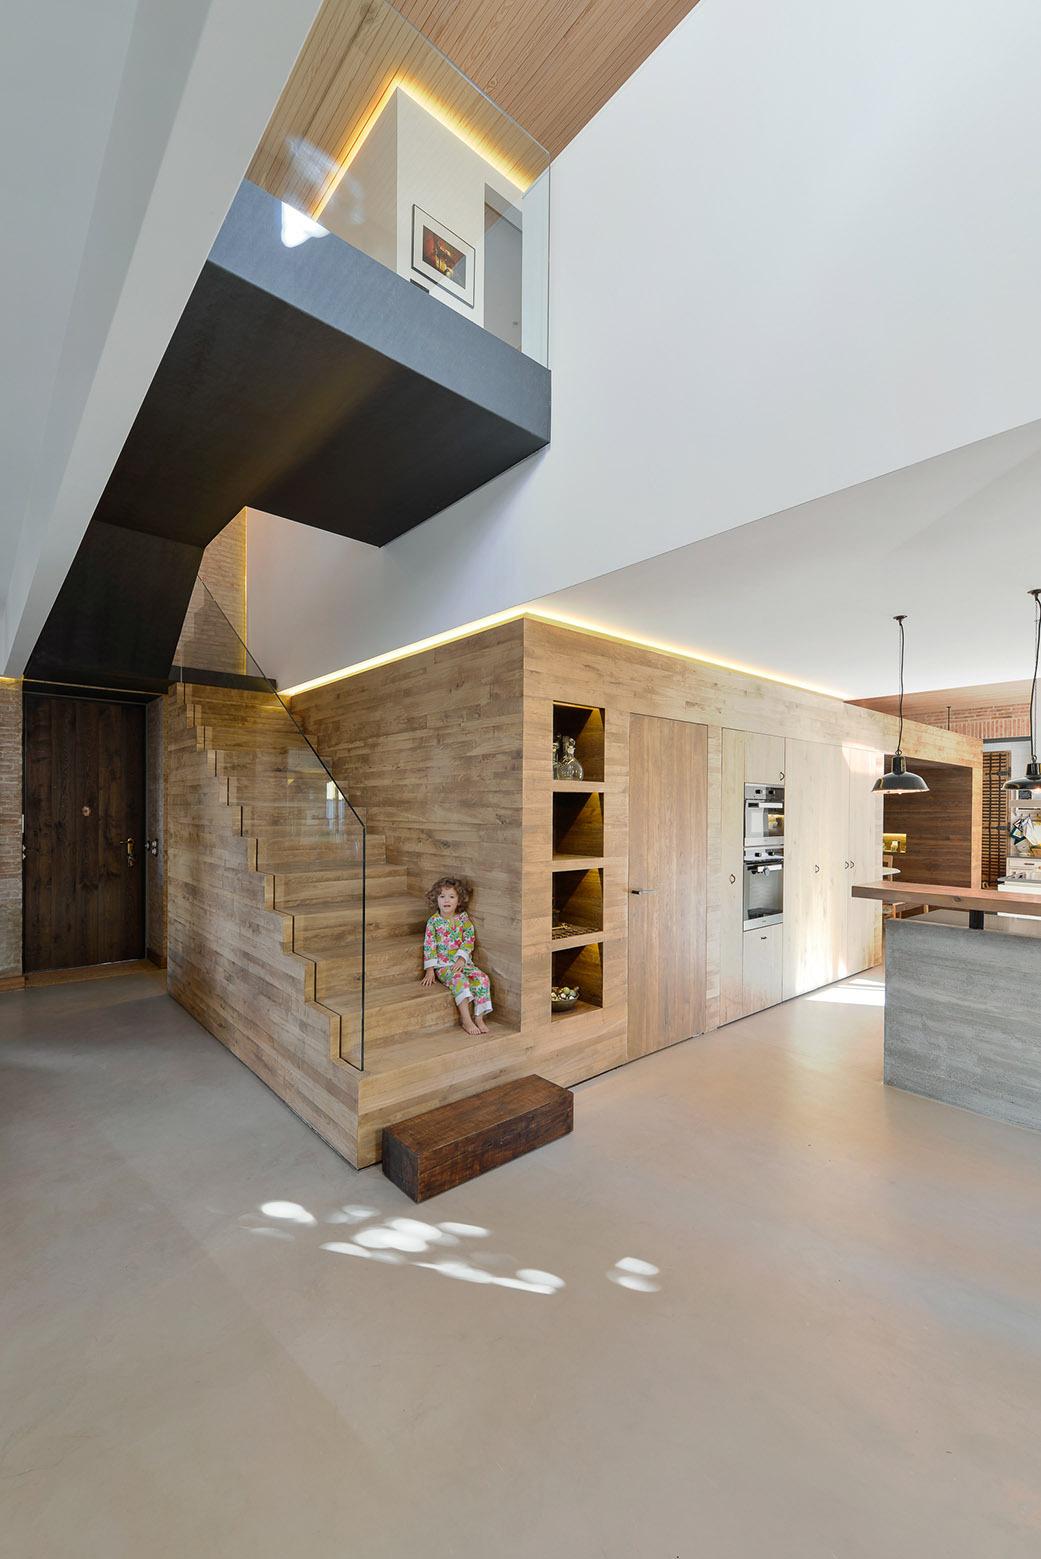 A Dream House Design That Bridges Historic And Contemporary Elements ...